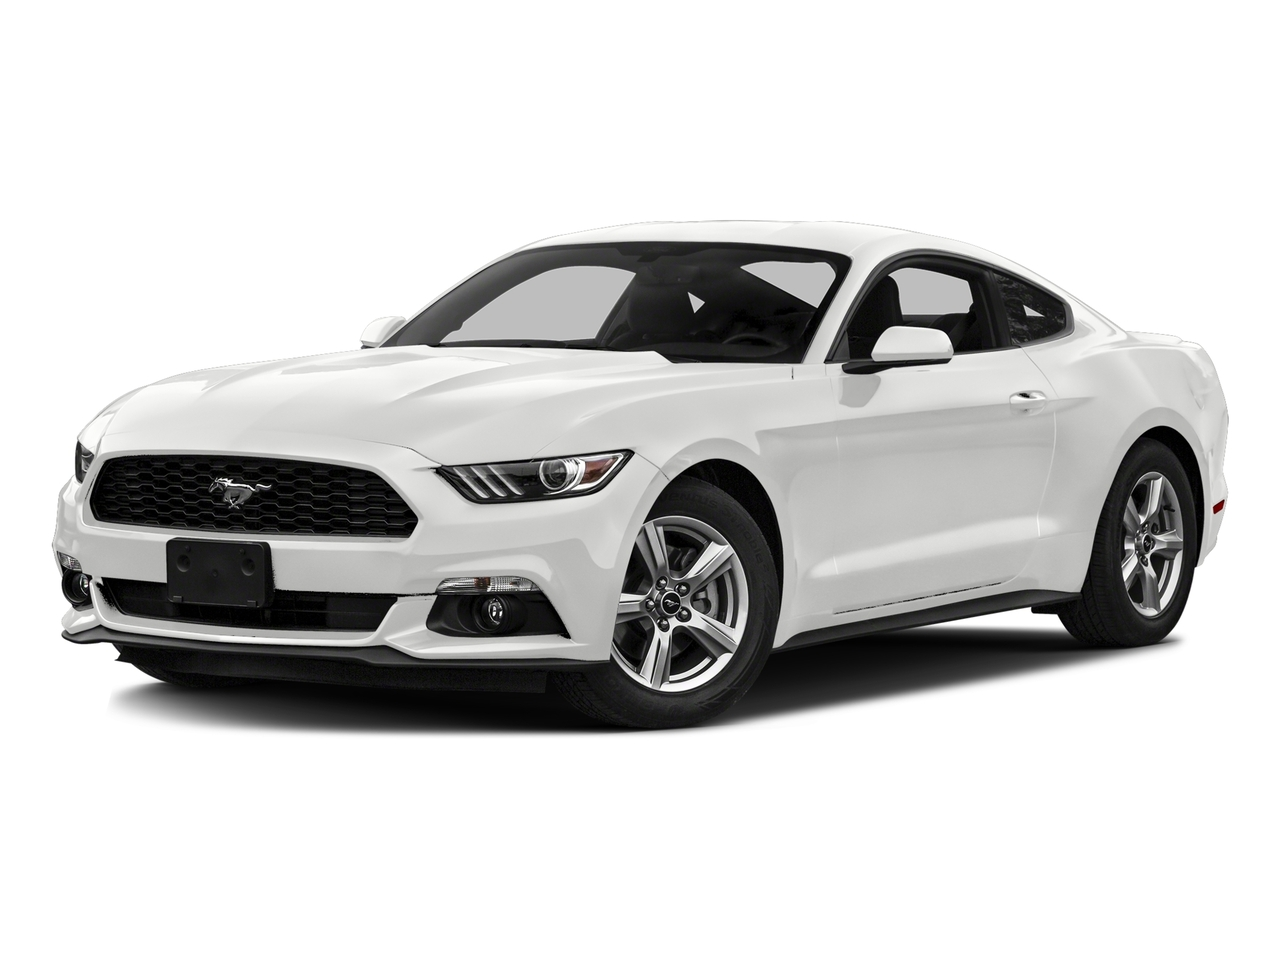 Oxford White 2016 Ford Mustang V6 2dr Car Winston-Salem NC